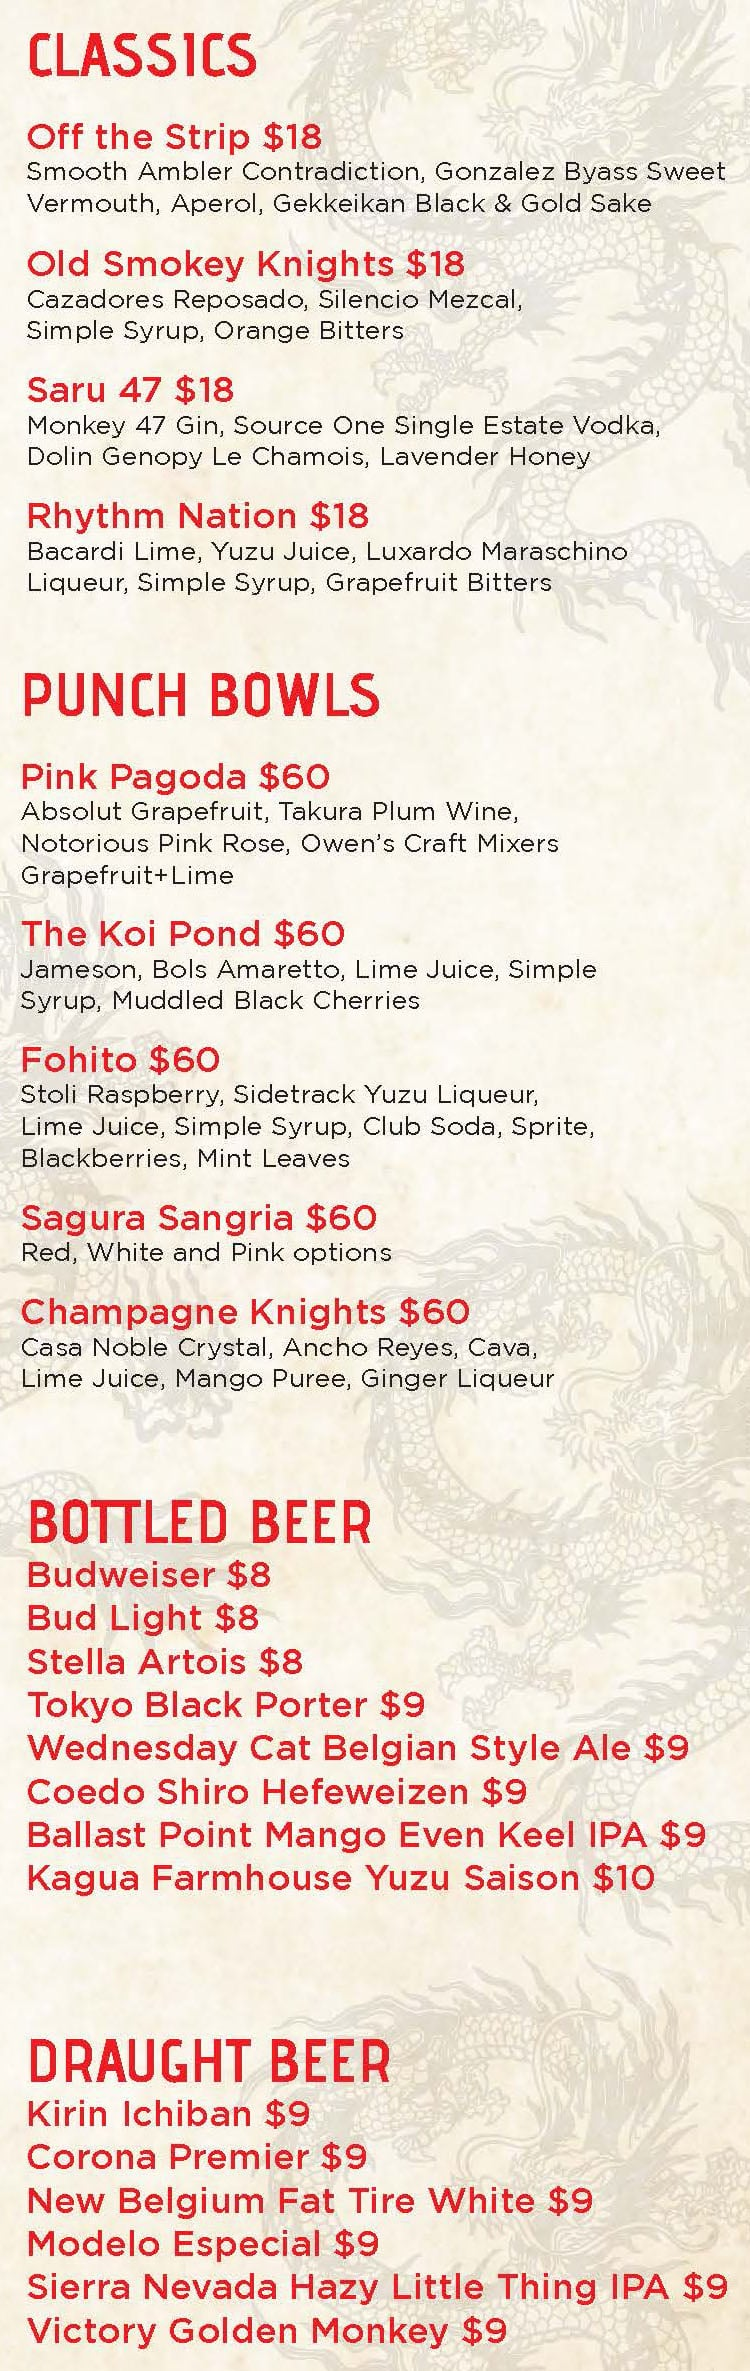 Sake Rok Las Vegas menu - classic cocktails, punch bowls, beers